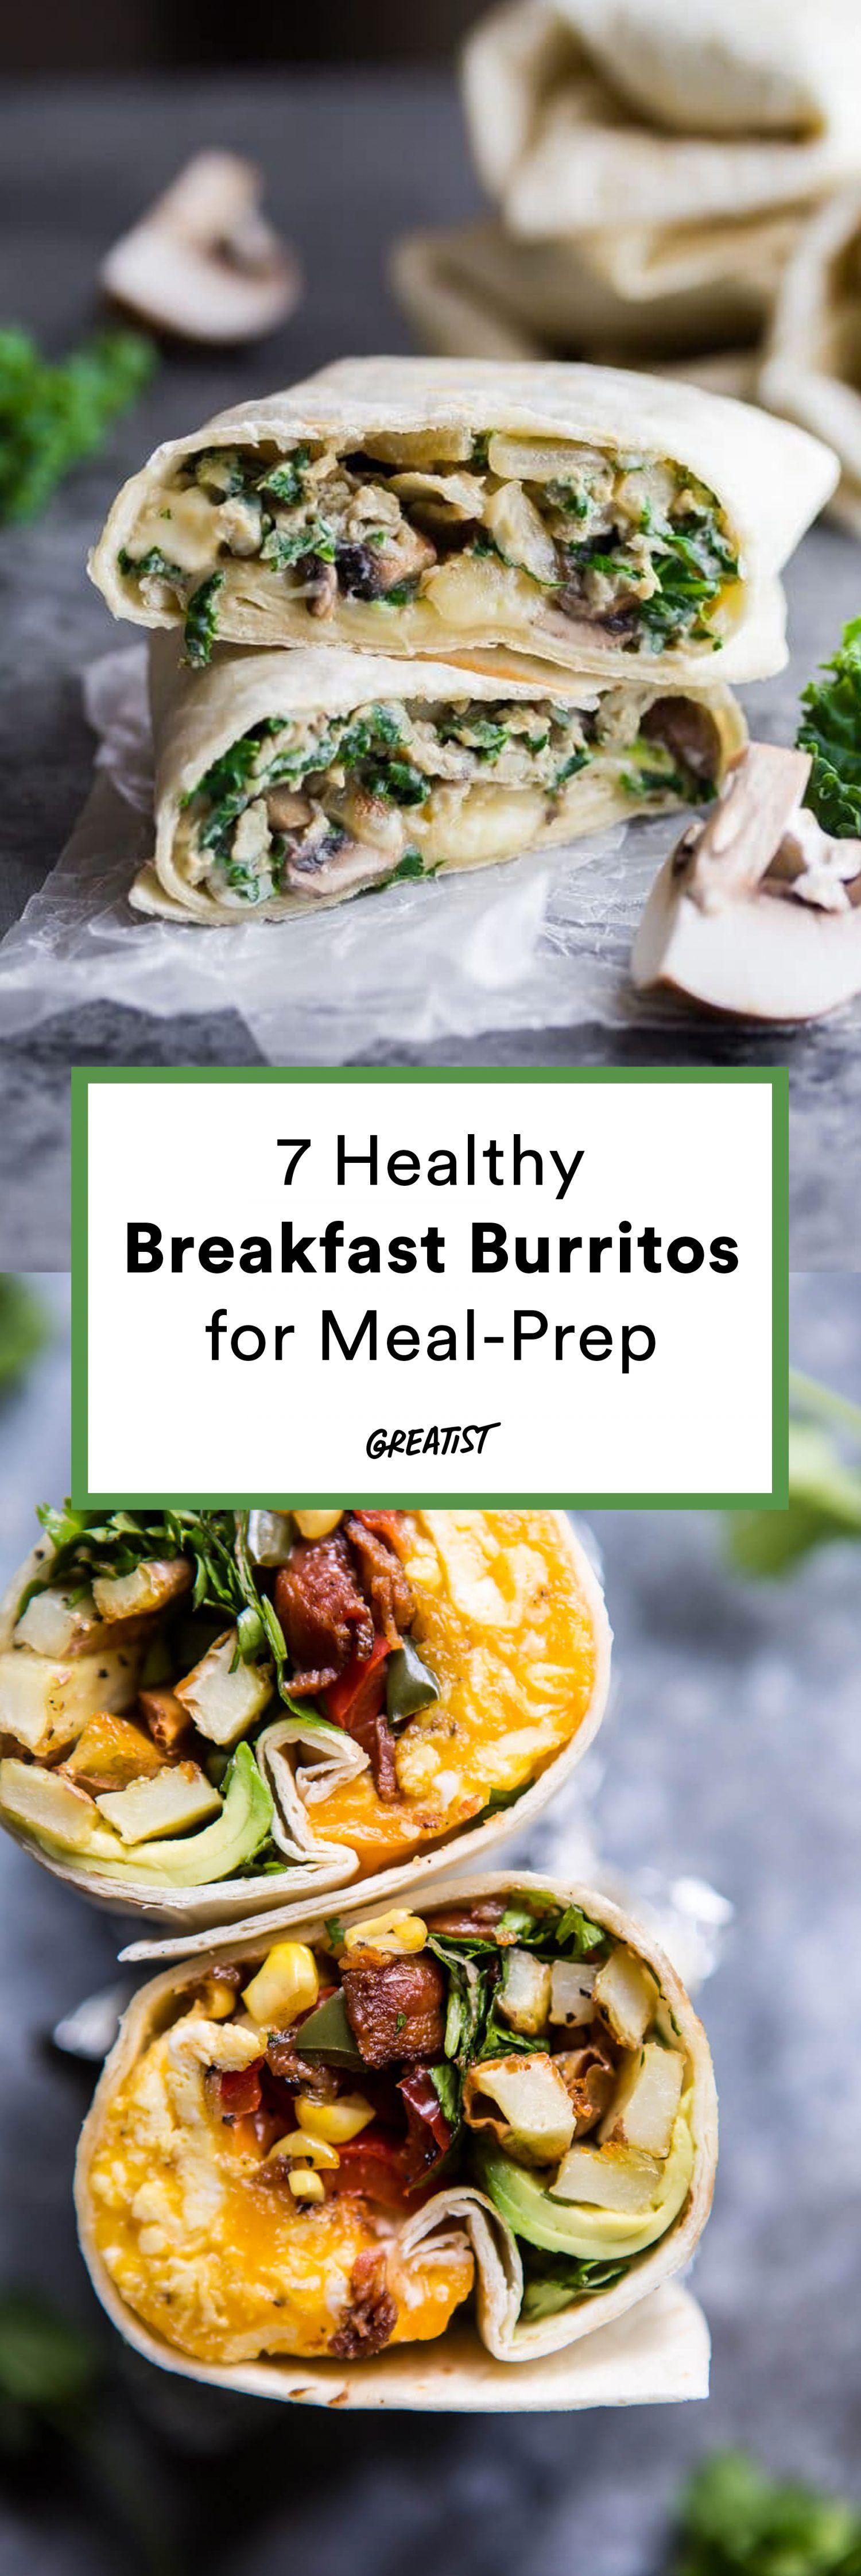 7 Breakfast Burritos You Can Meal Prep Freeze And Reheat Healthy Breakfast Wraps Healthy Breakfast Burrito Clean Eating Breakfast